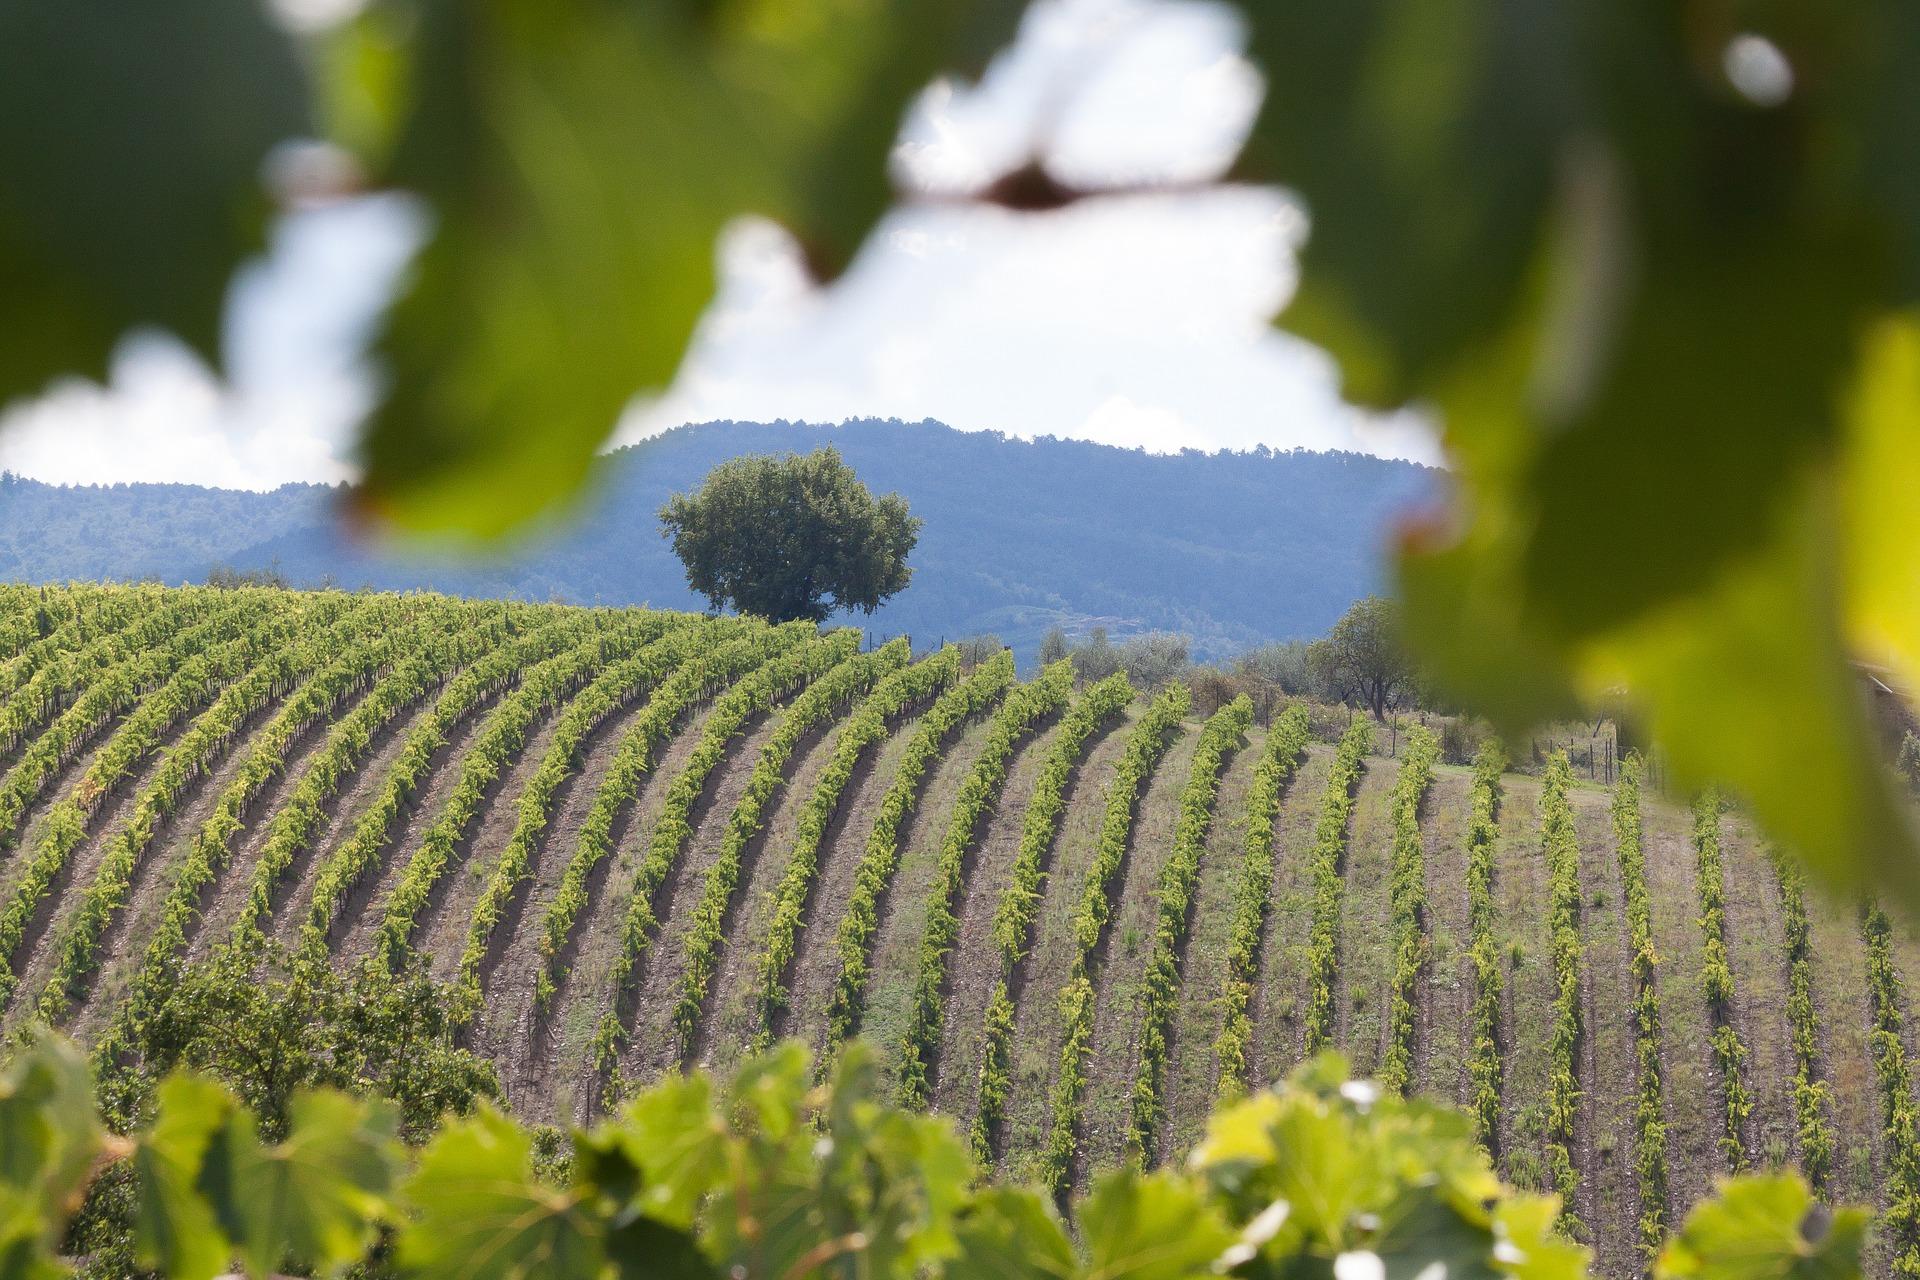 vineyard-989270_1920